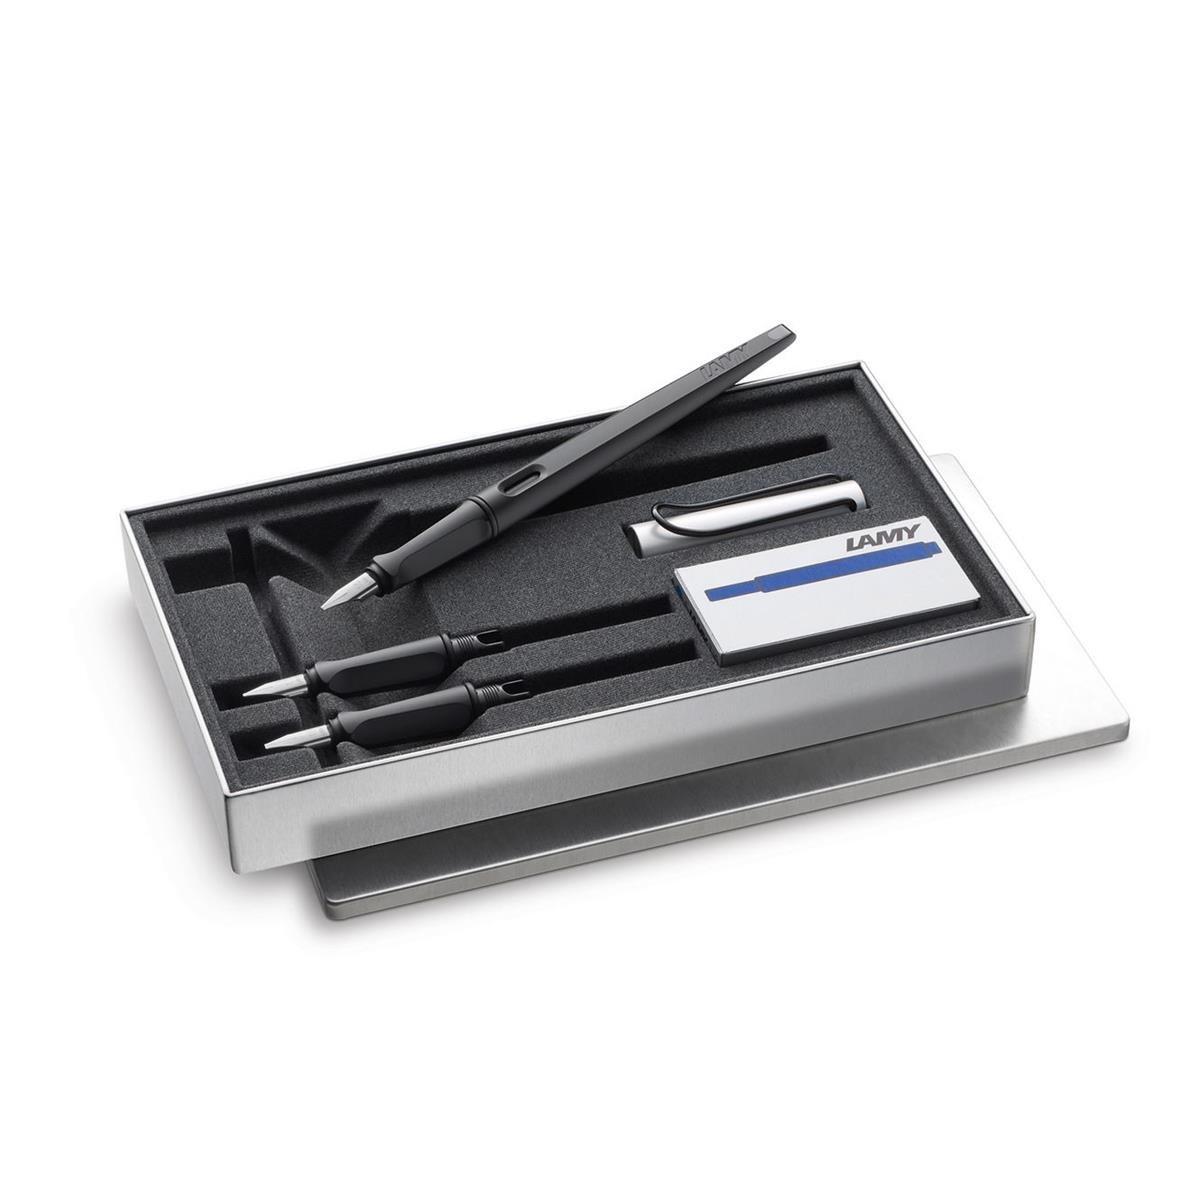 Lamy 1217713Calligraphy Pen Set Joy AL M11